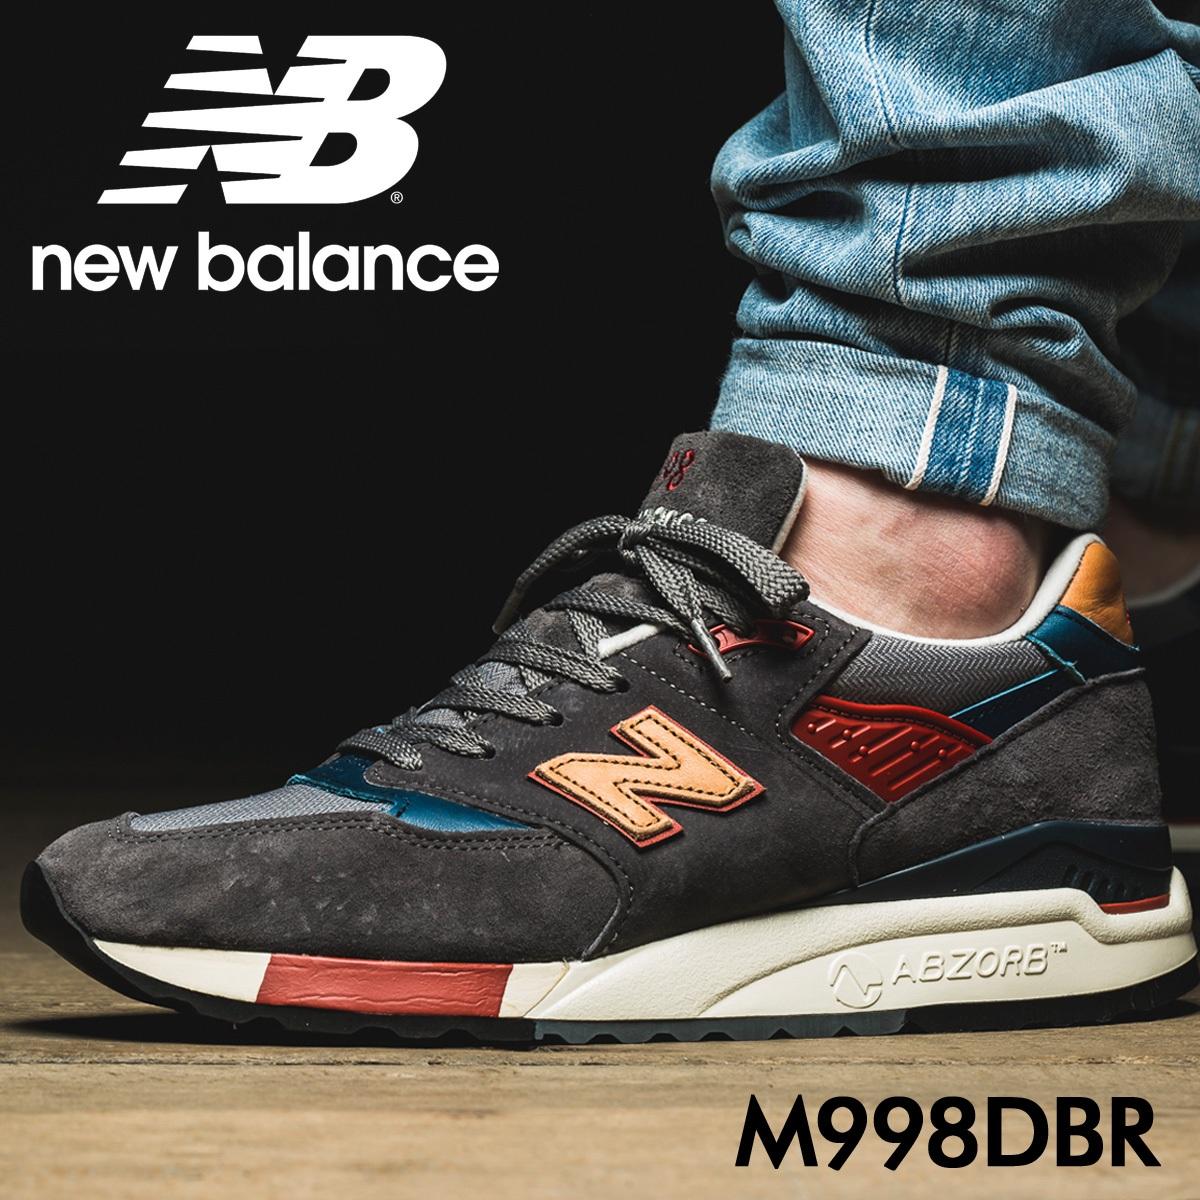 new balance 998 mid century modern